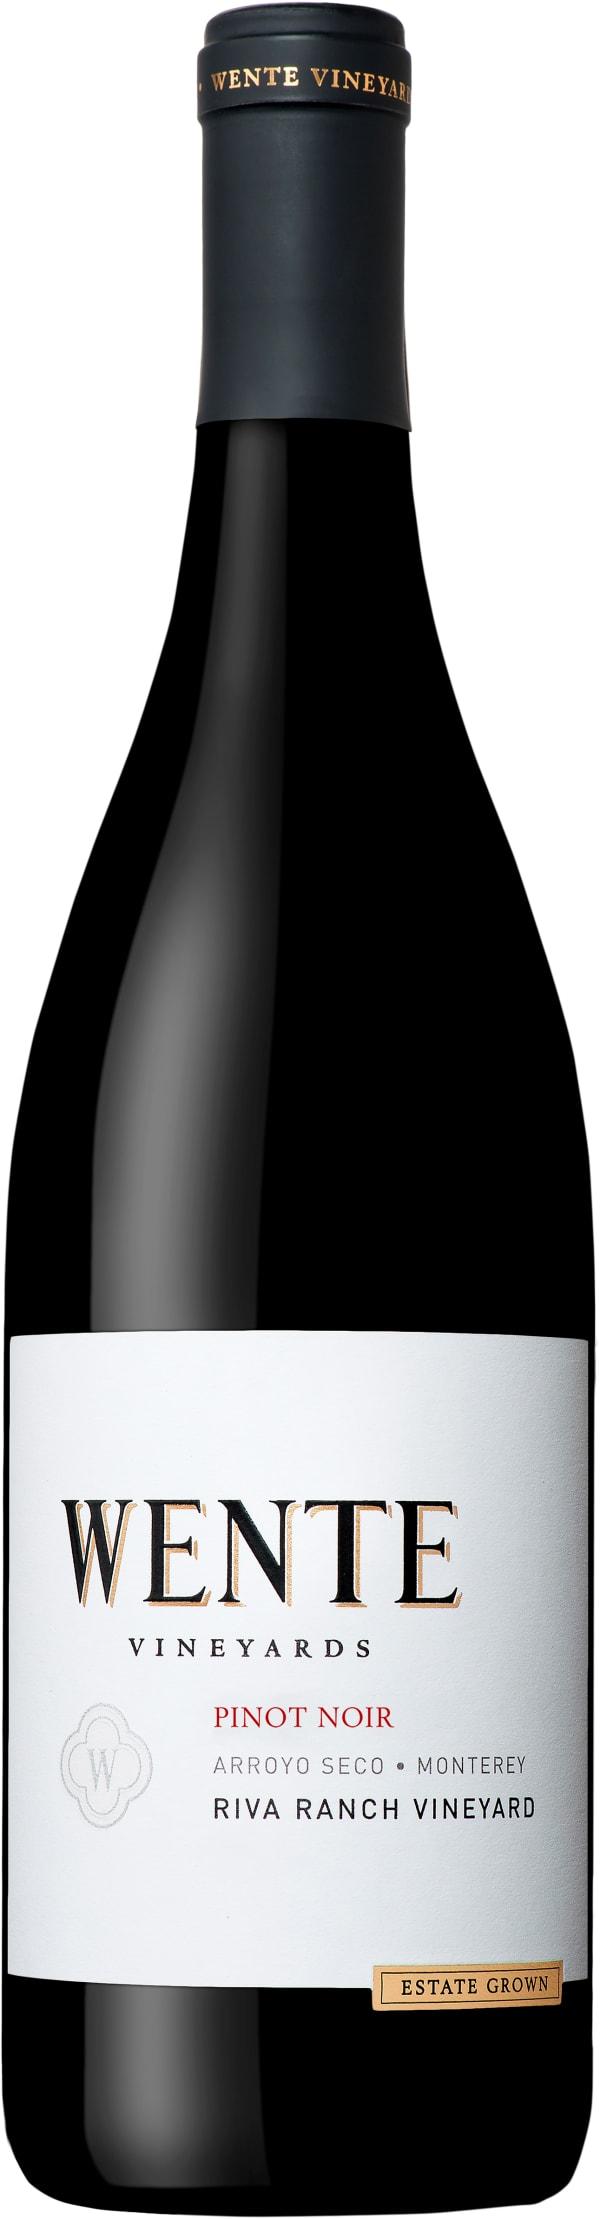 Wente Riva Ranch Pinot Noir 2013